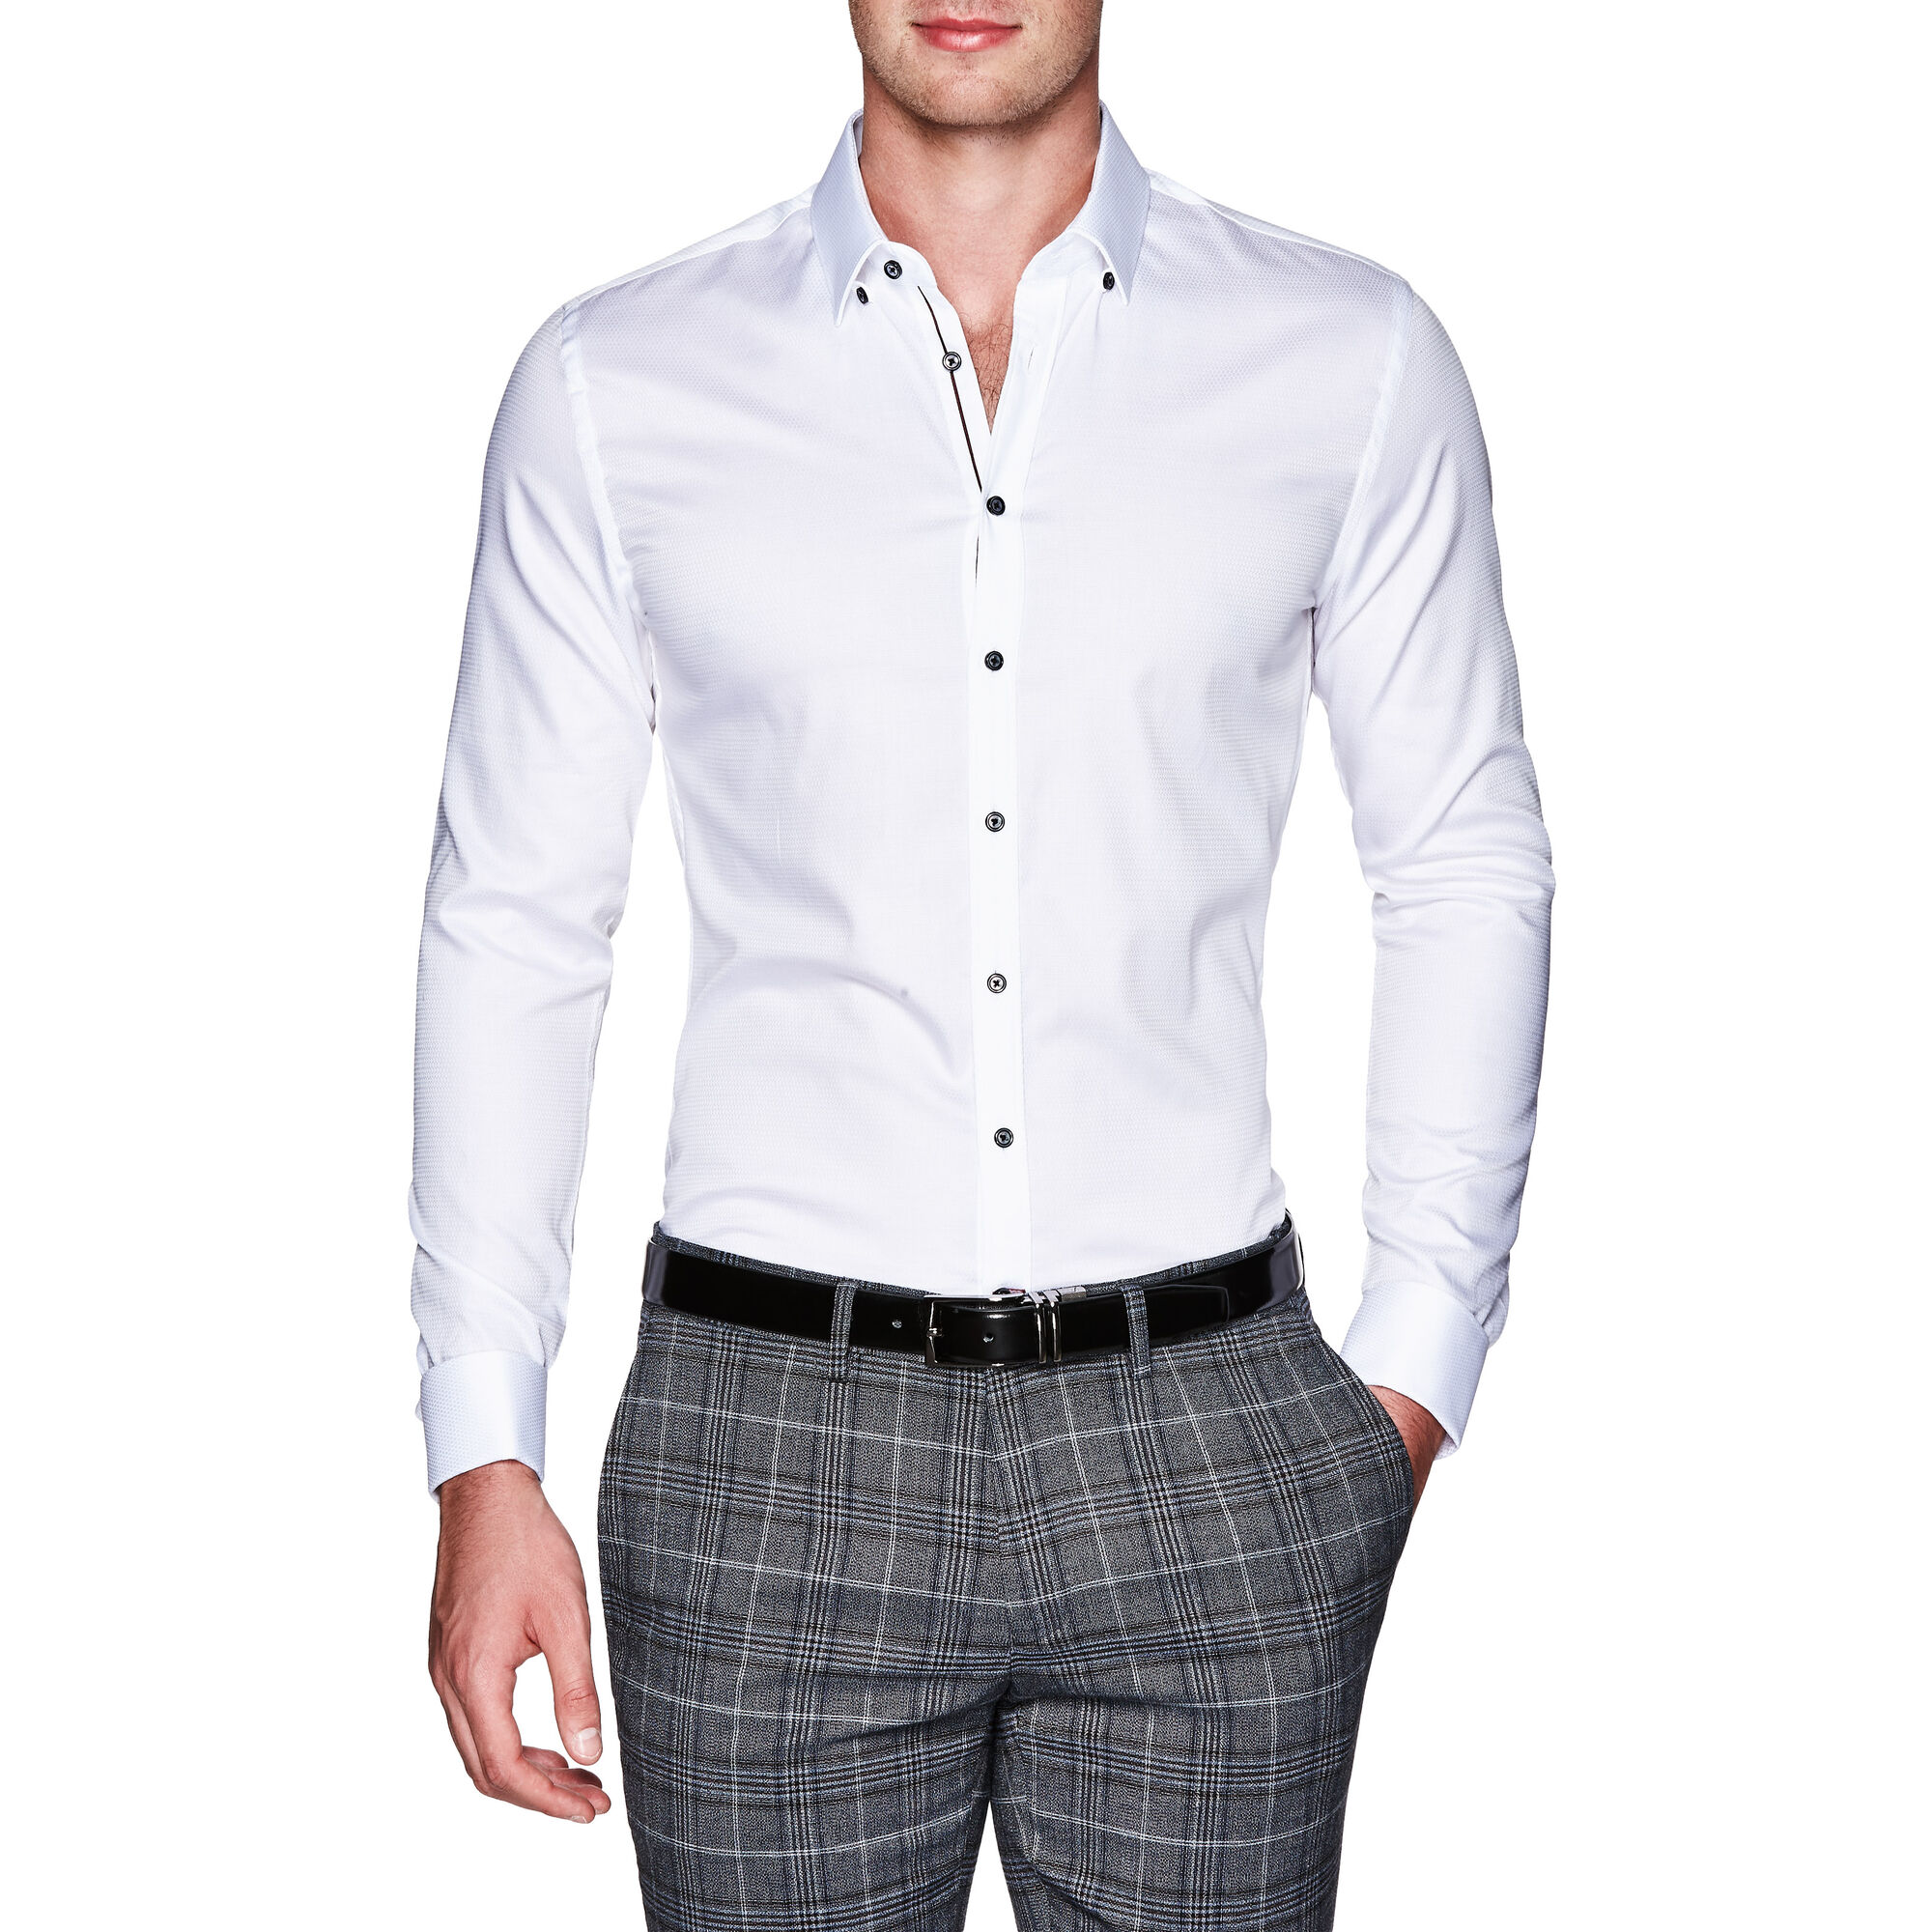 Sully - White - French Cuffed Slim Shirt | Politix